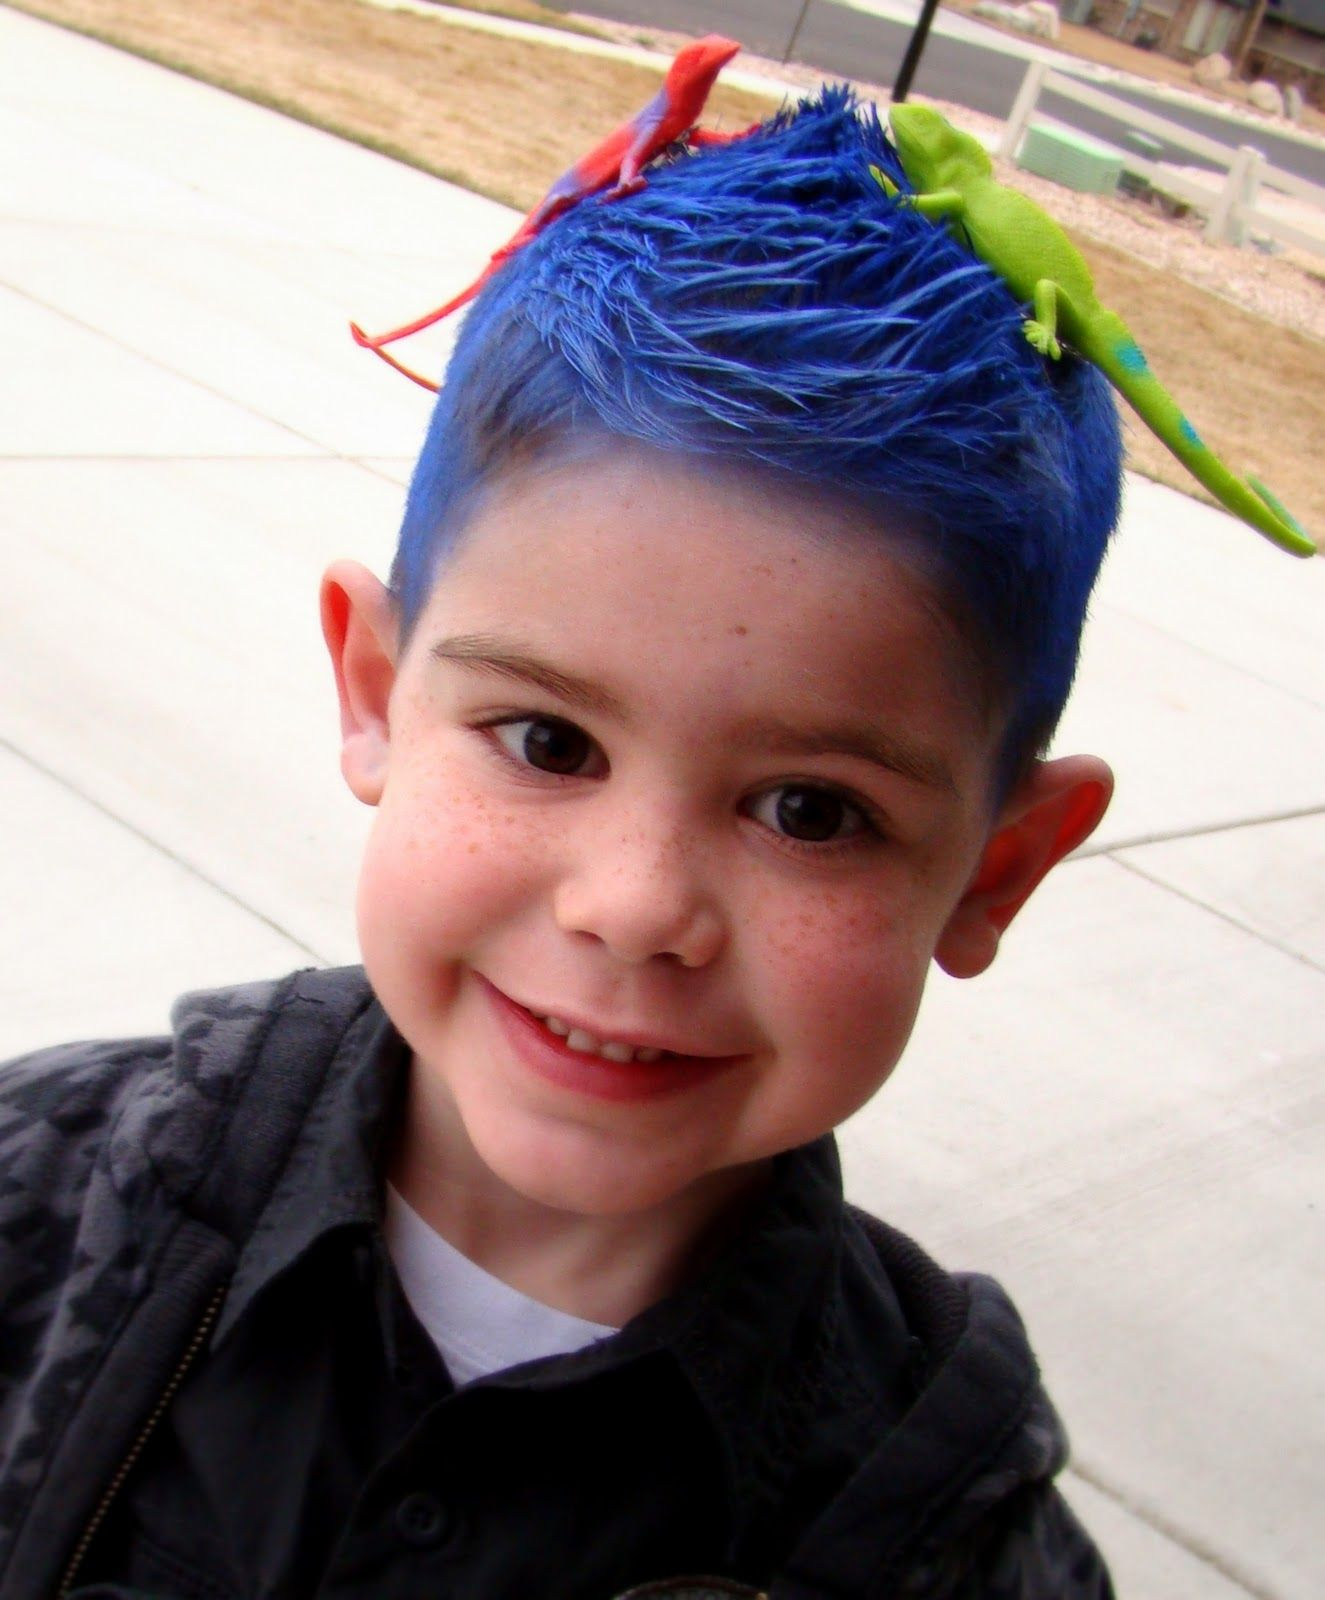 Crazy Hair Day For School Idea